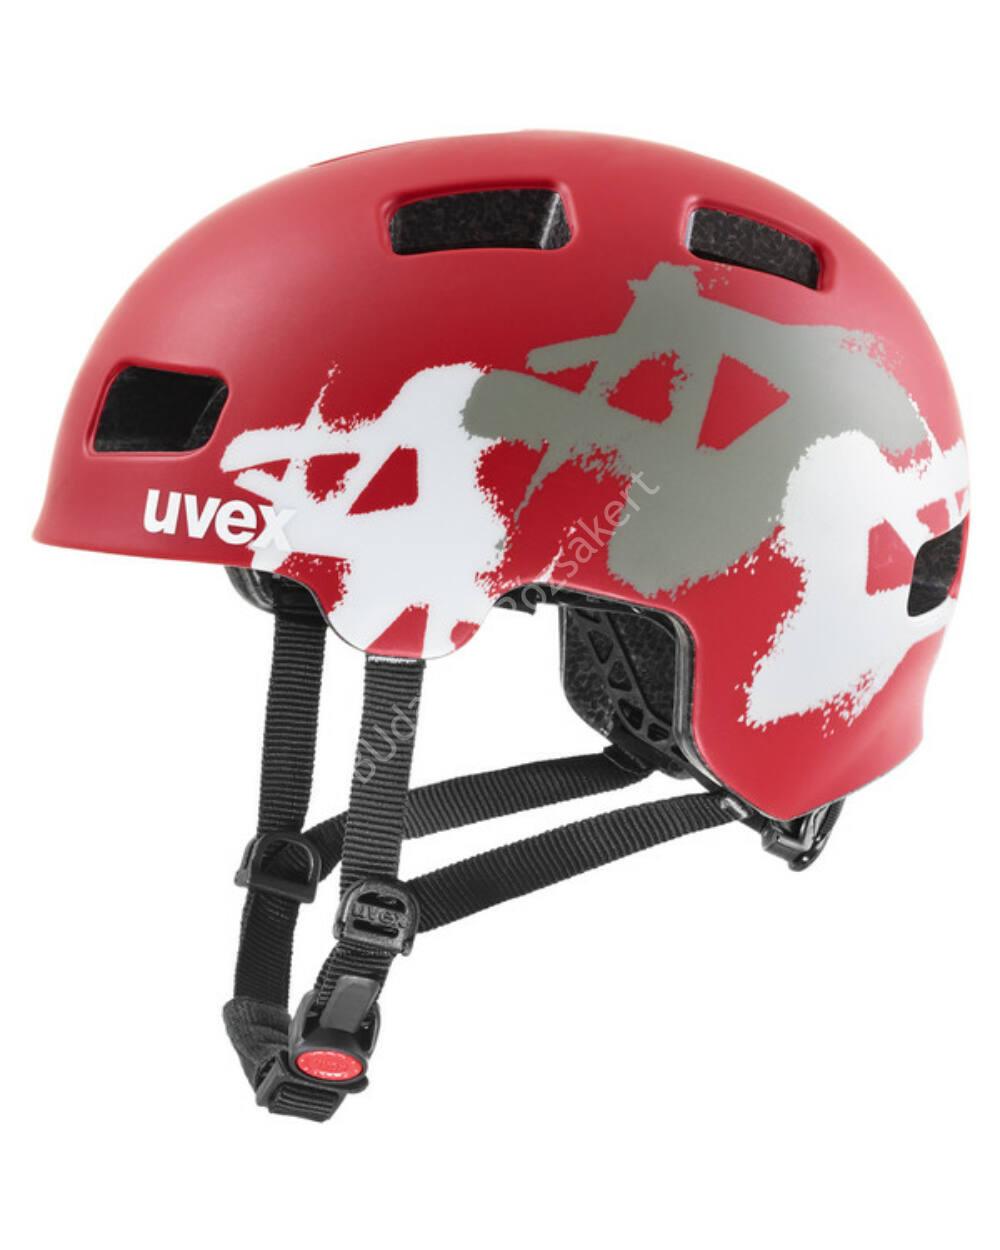 Uvex Hlmt 4 CC red mat bukósisak, 51-55 cm